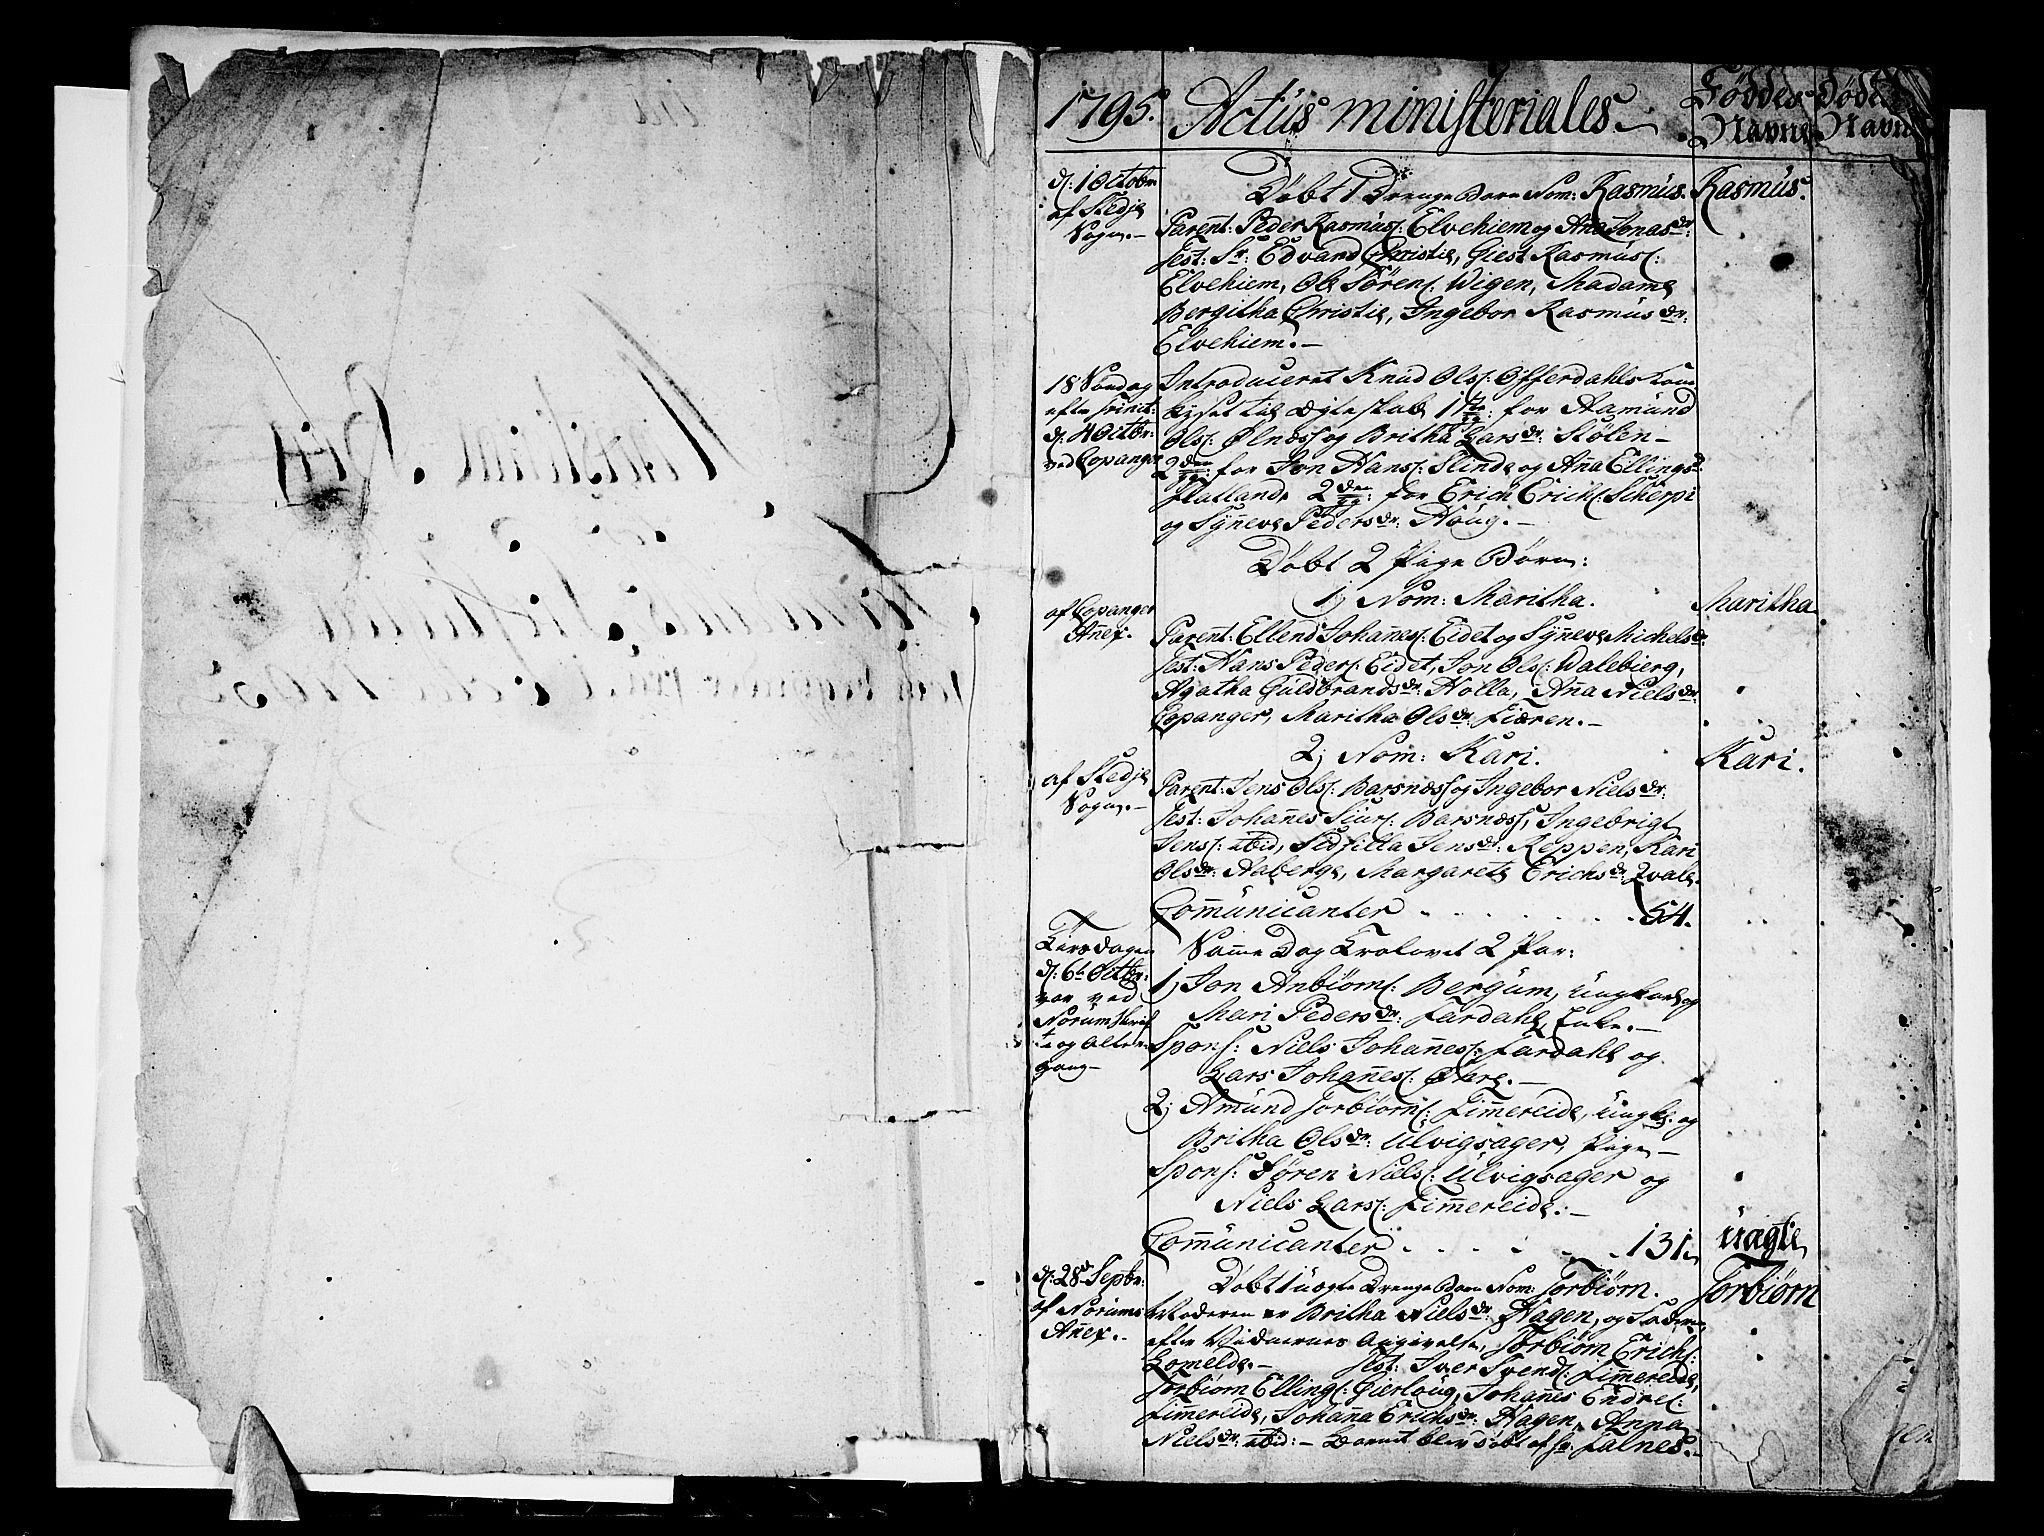 SAB, Sogndal Sokneprestembete, H/Haa/Haaa/L0008: Ministerialbok nr. A 8, 1795-1809, s. 2